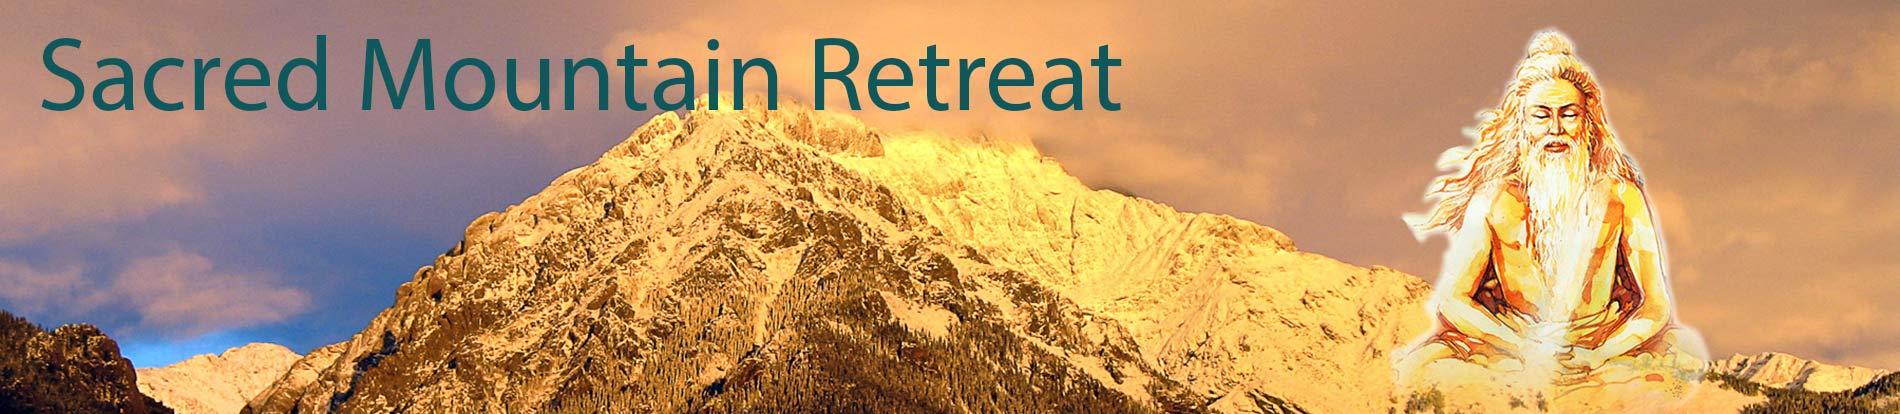 Yogiraj Dr Ramnath Aghori - Sacred Mountain Retreat